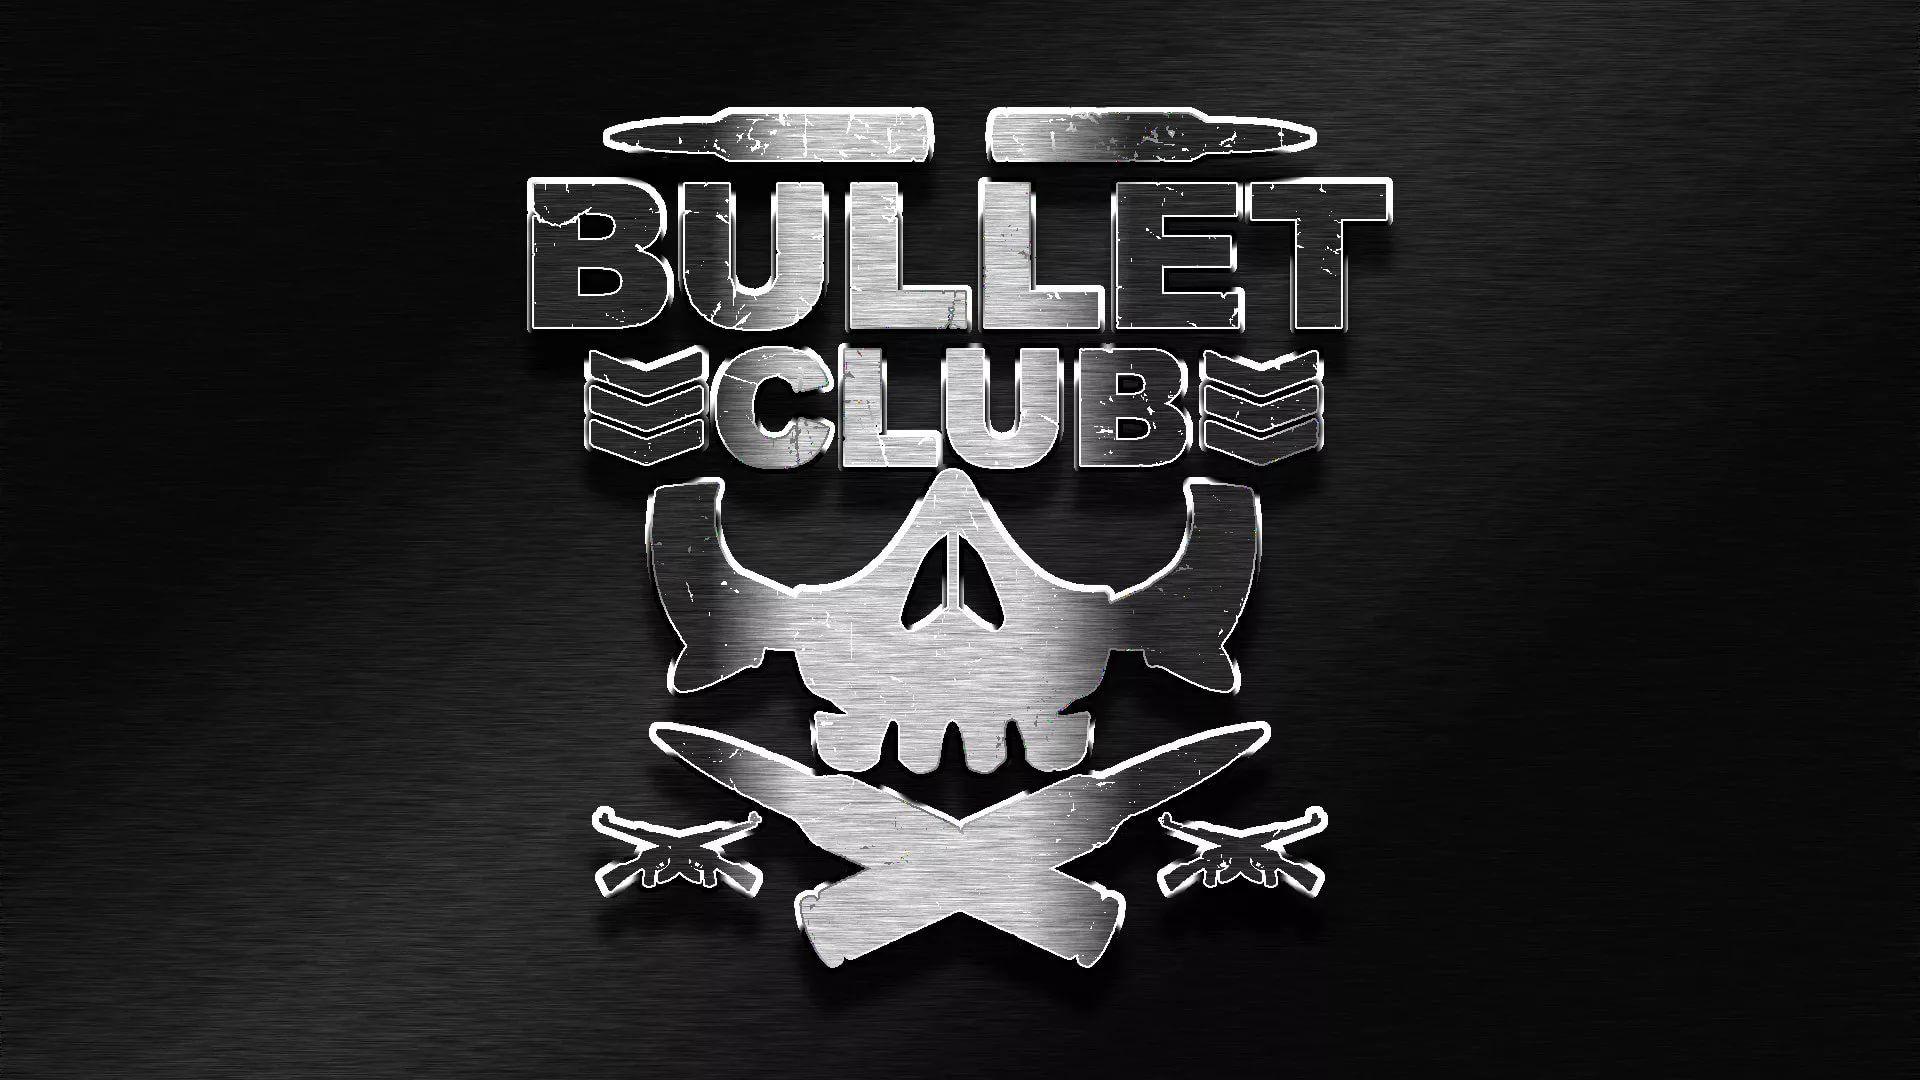 Bullet Club full hd wallpaper for laptop